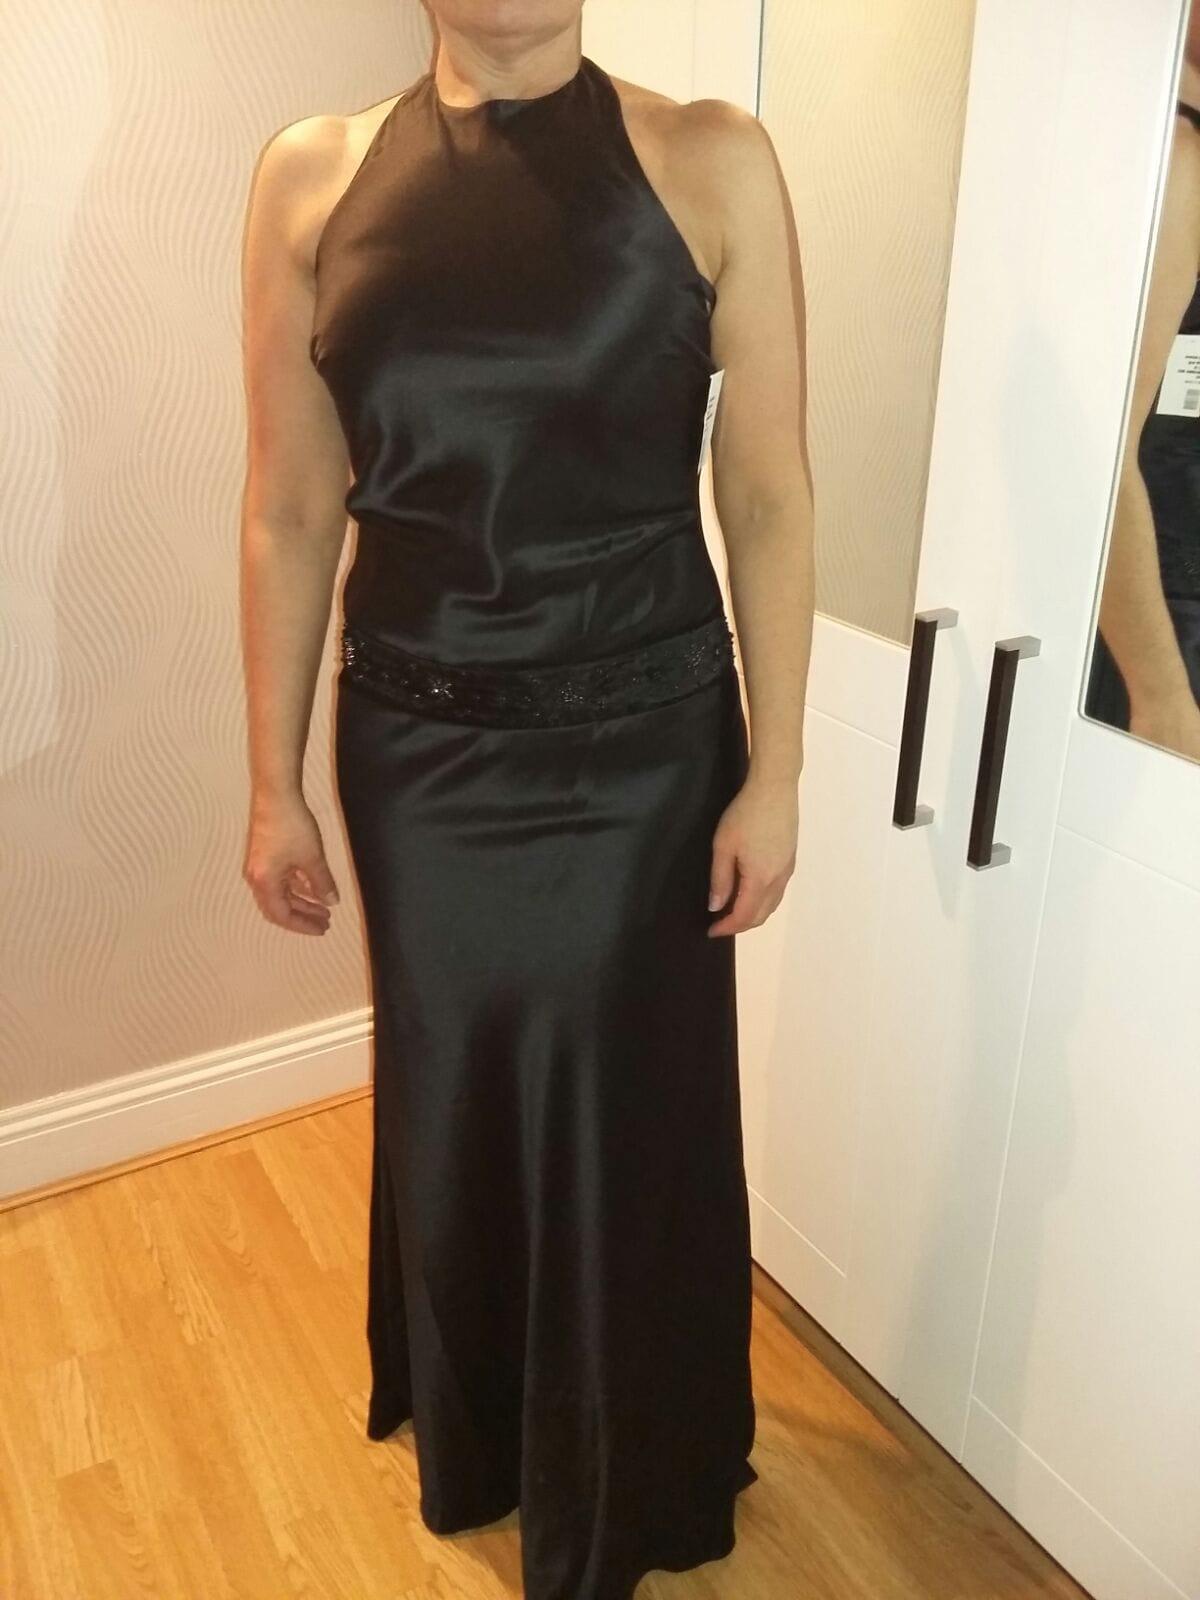 Bridal Heaven black satin bridesmaid dress